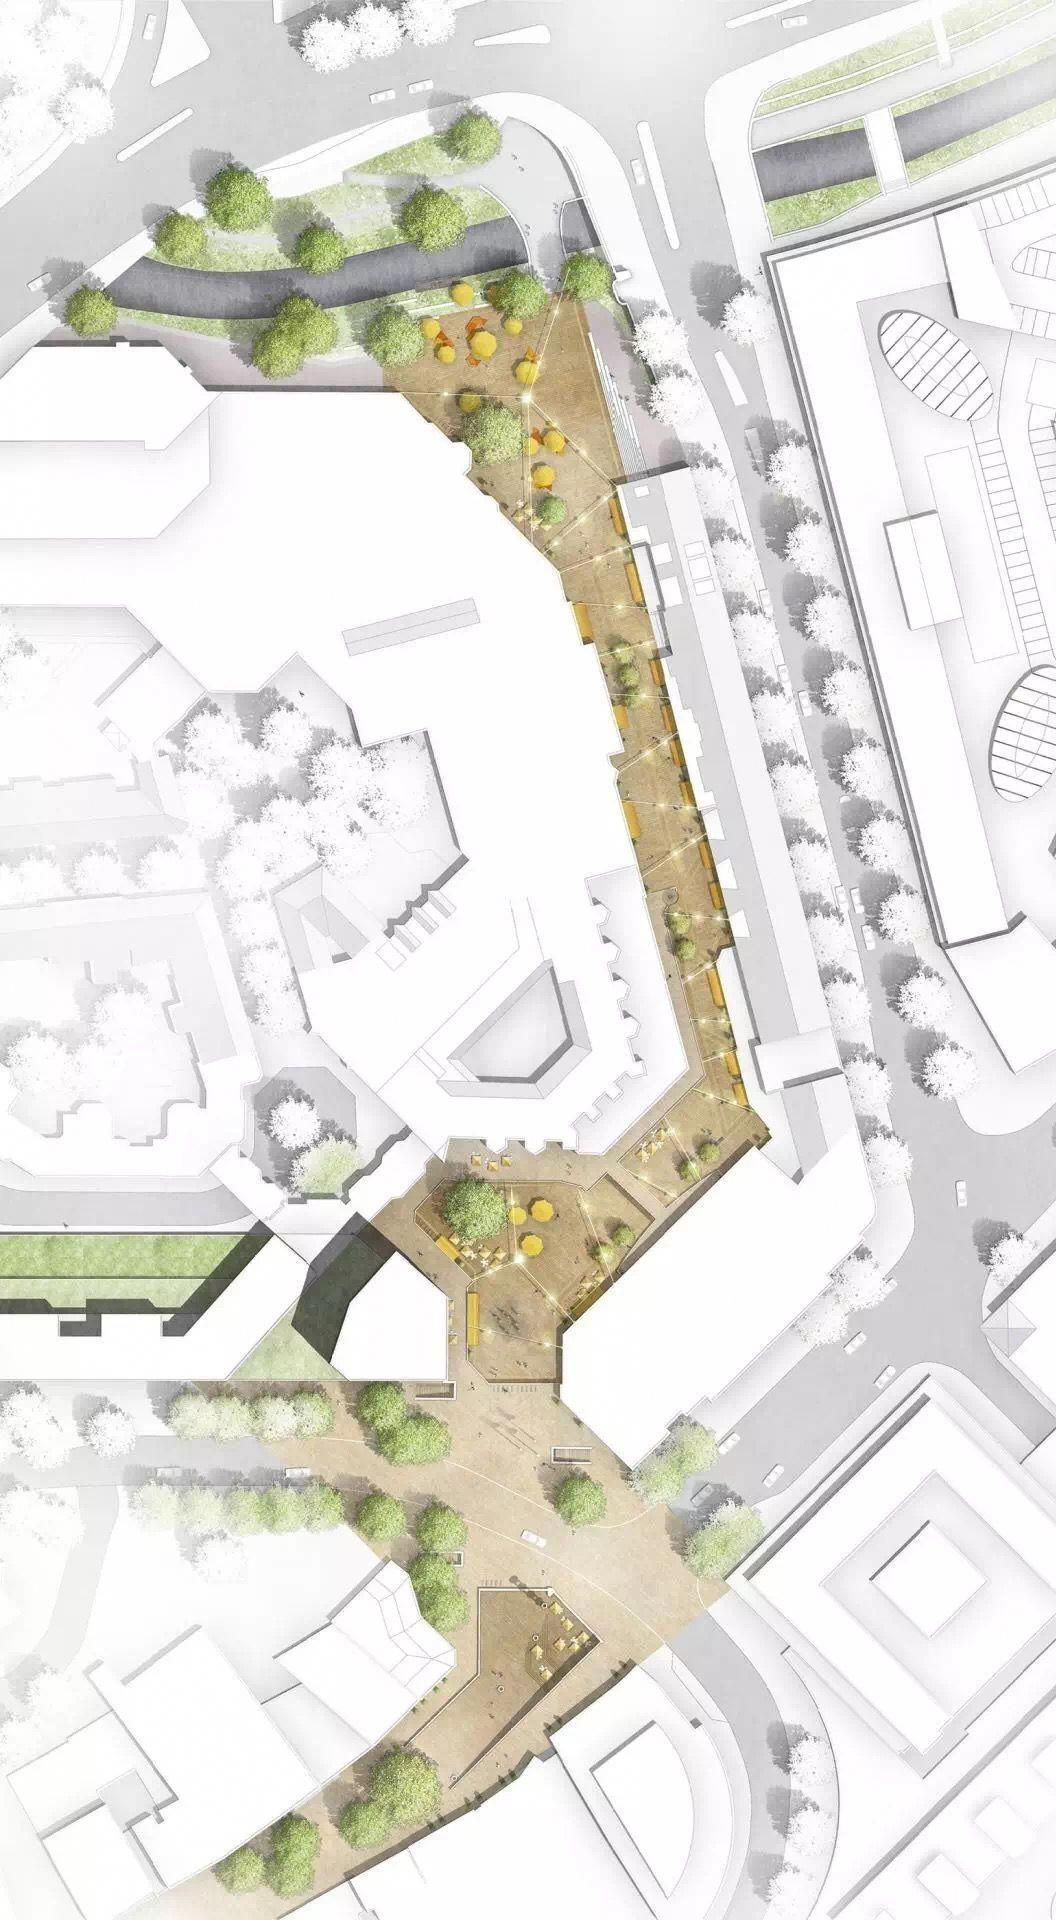 Colored Pedestrian Street Site Plan Landscapearchitectureplan Landscape Design Drawings Architecture Site Plan Landscape Architecture Design